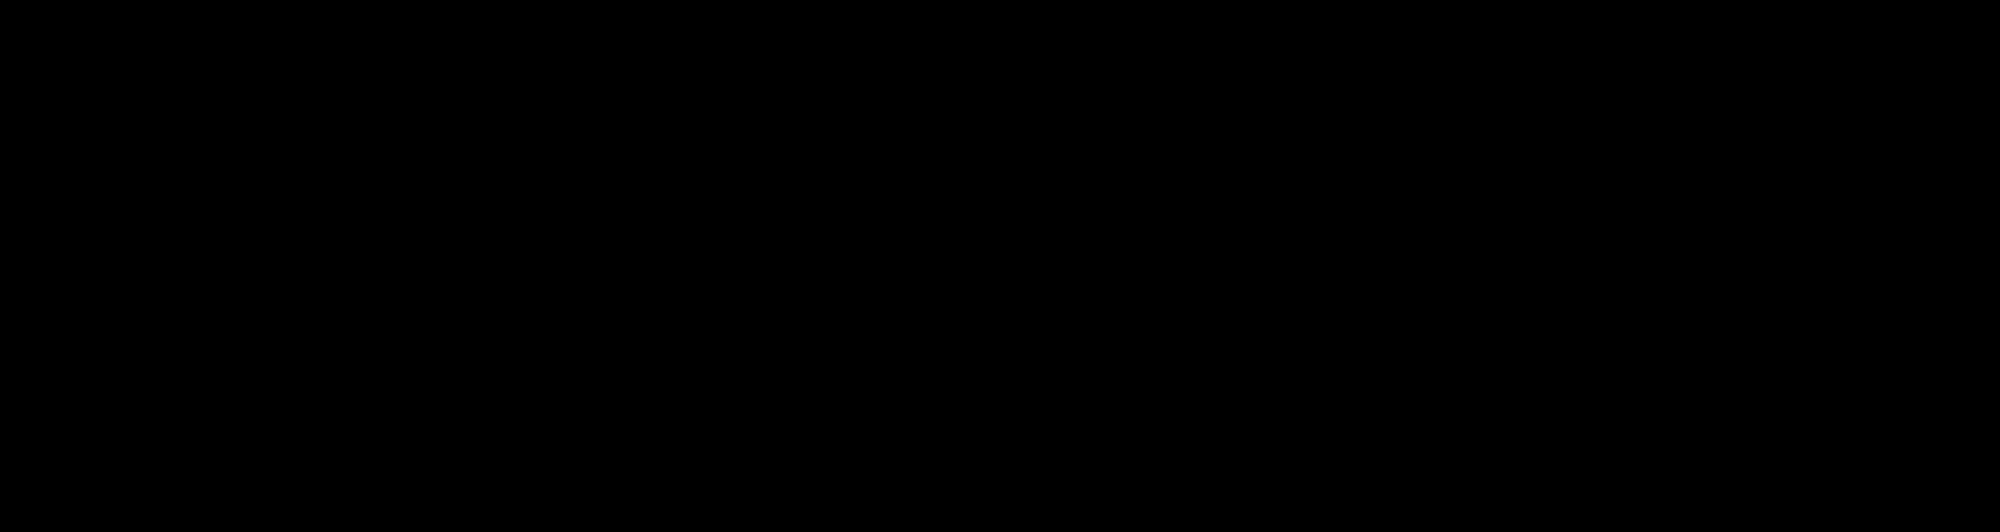 BLACK-logo-black.png